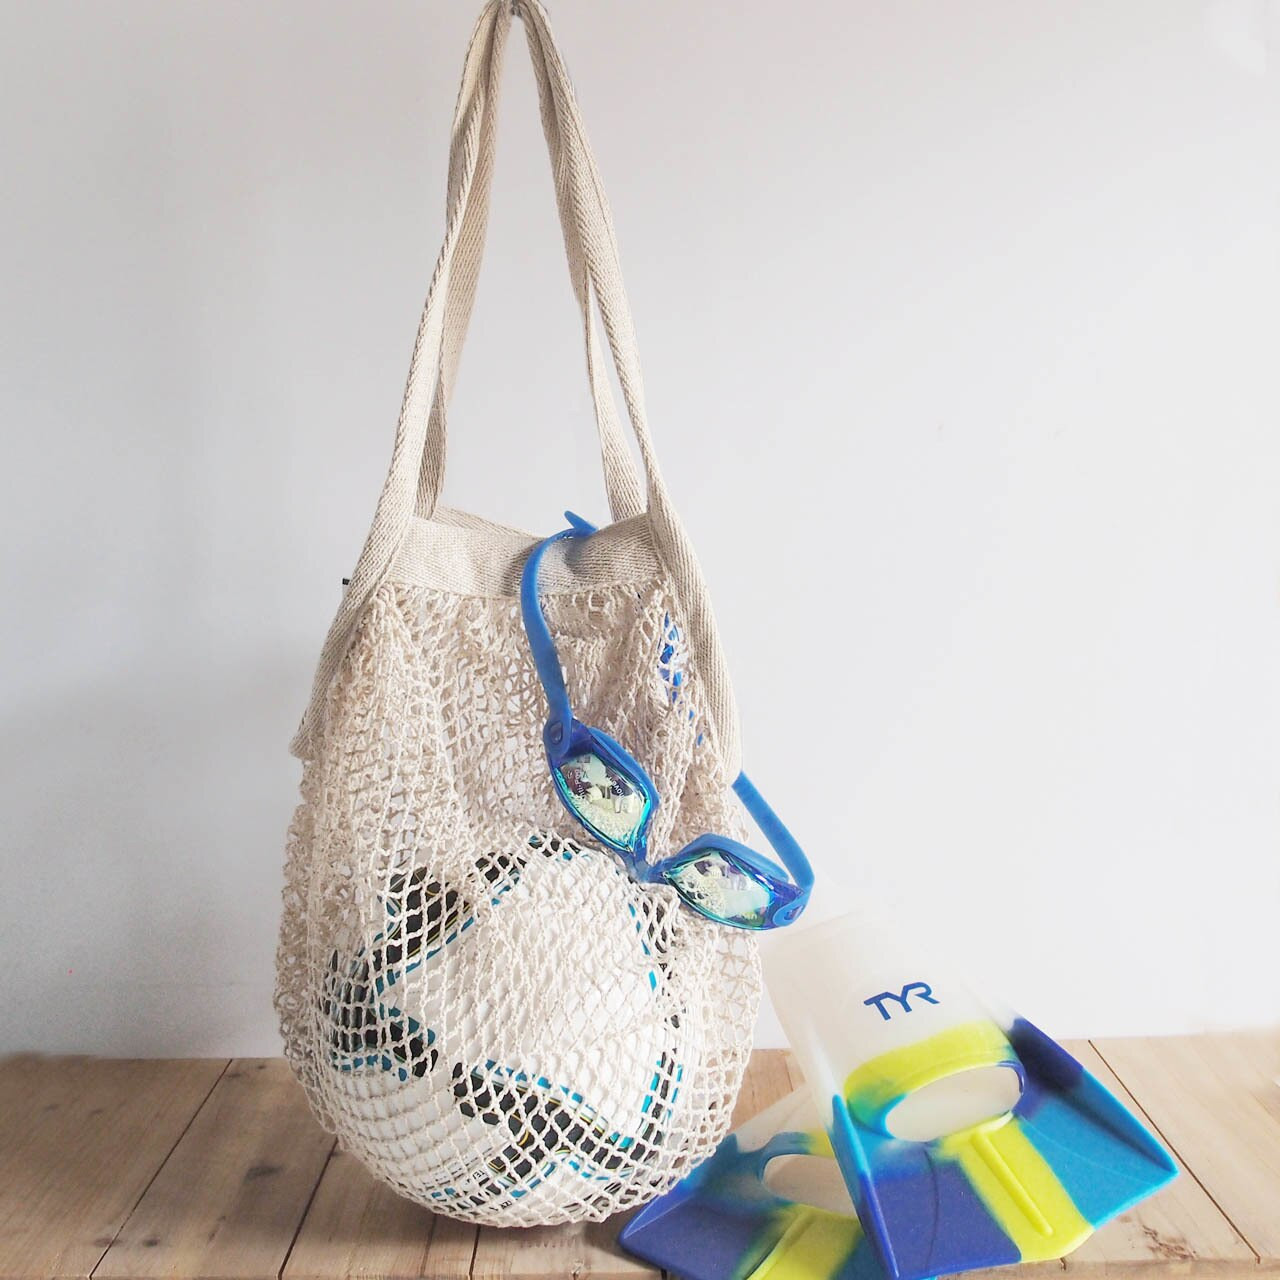 Wholesale Cotton Net Bags, Organic Cotton Produce Bags, Organic Cotton Mesh Market Tote B700-02 | Packaging Decor